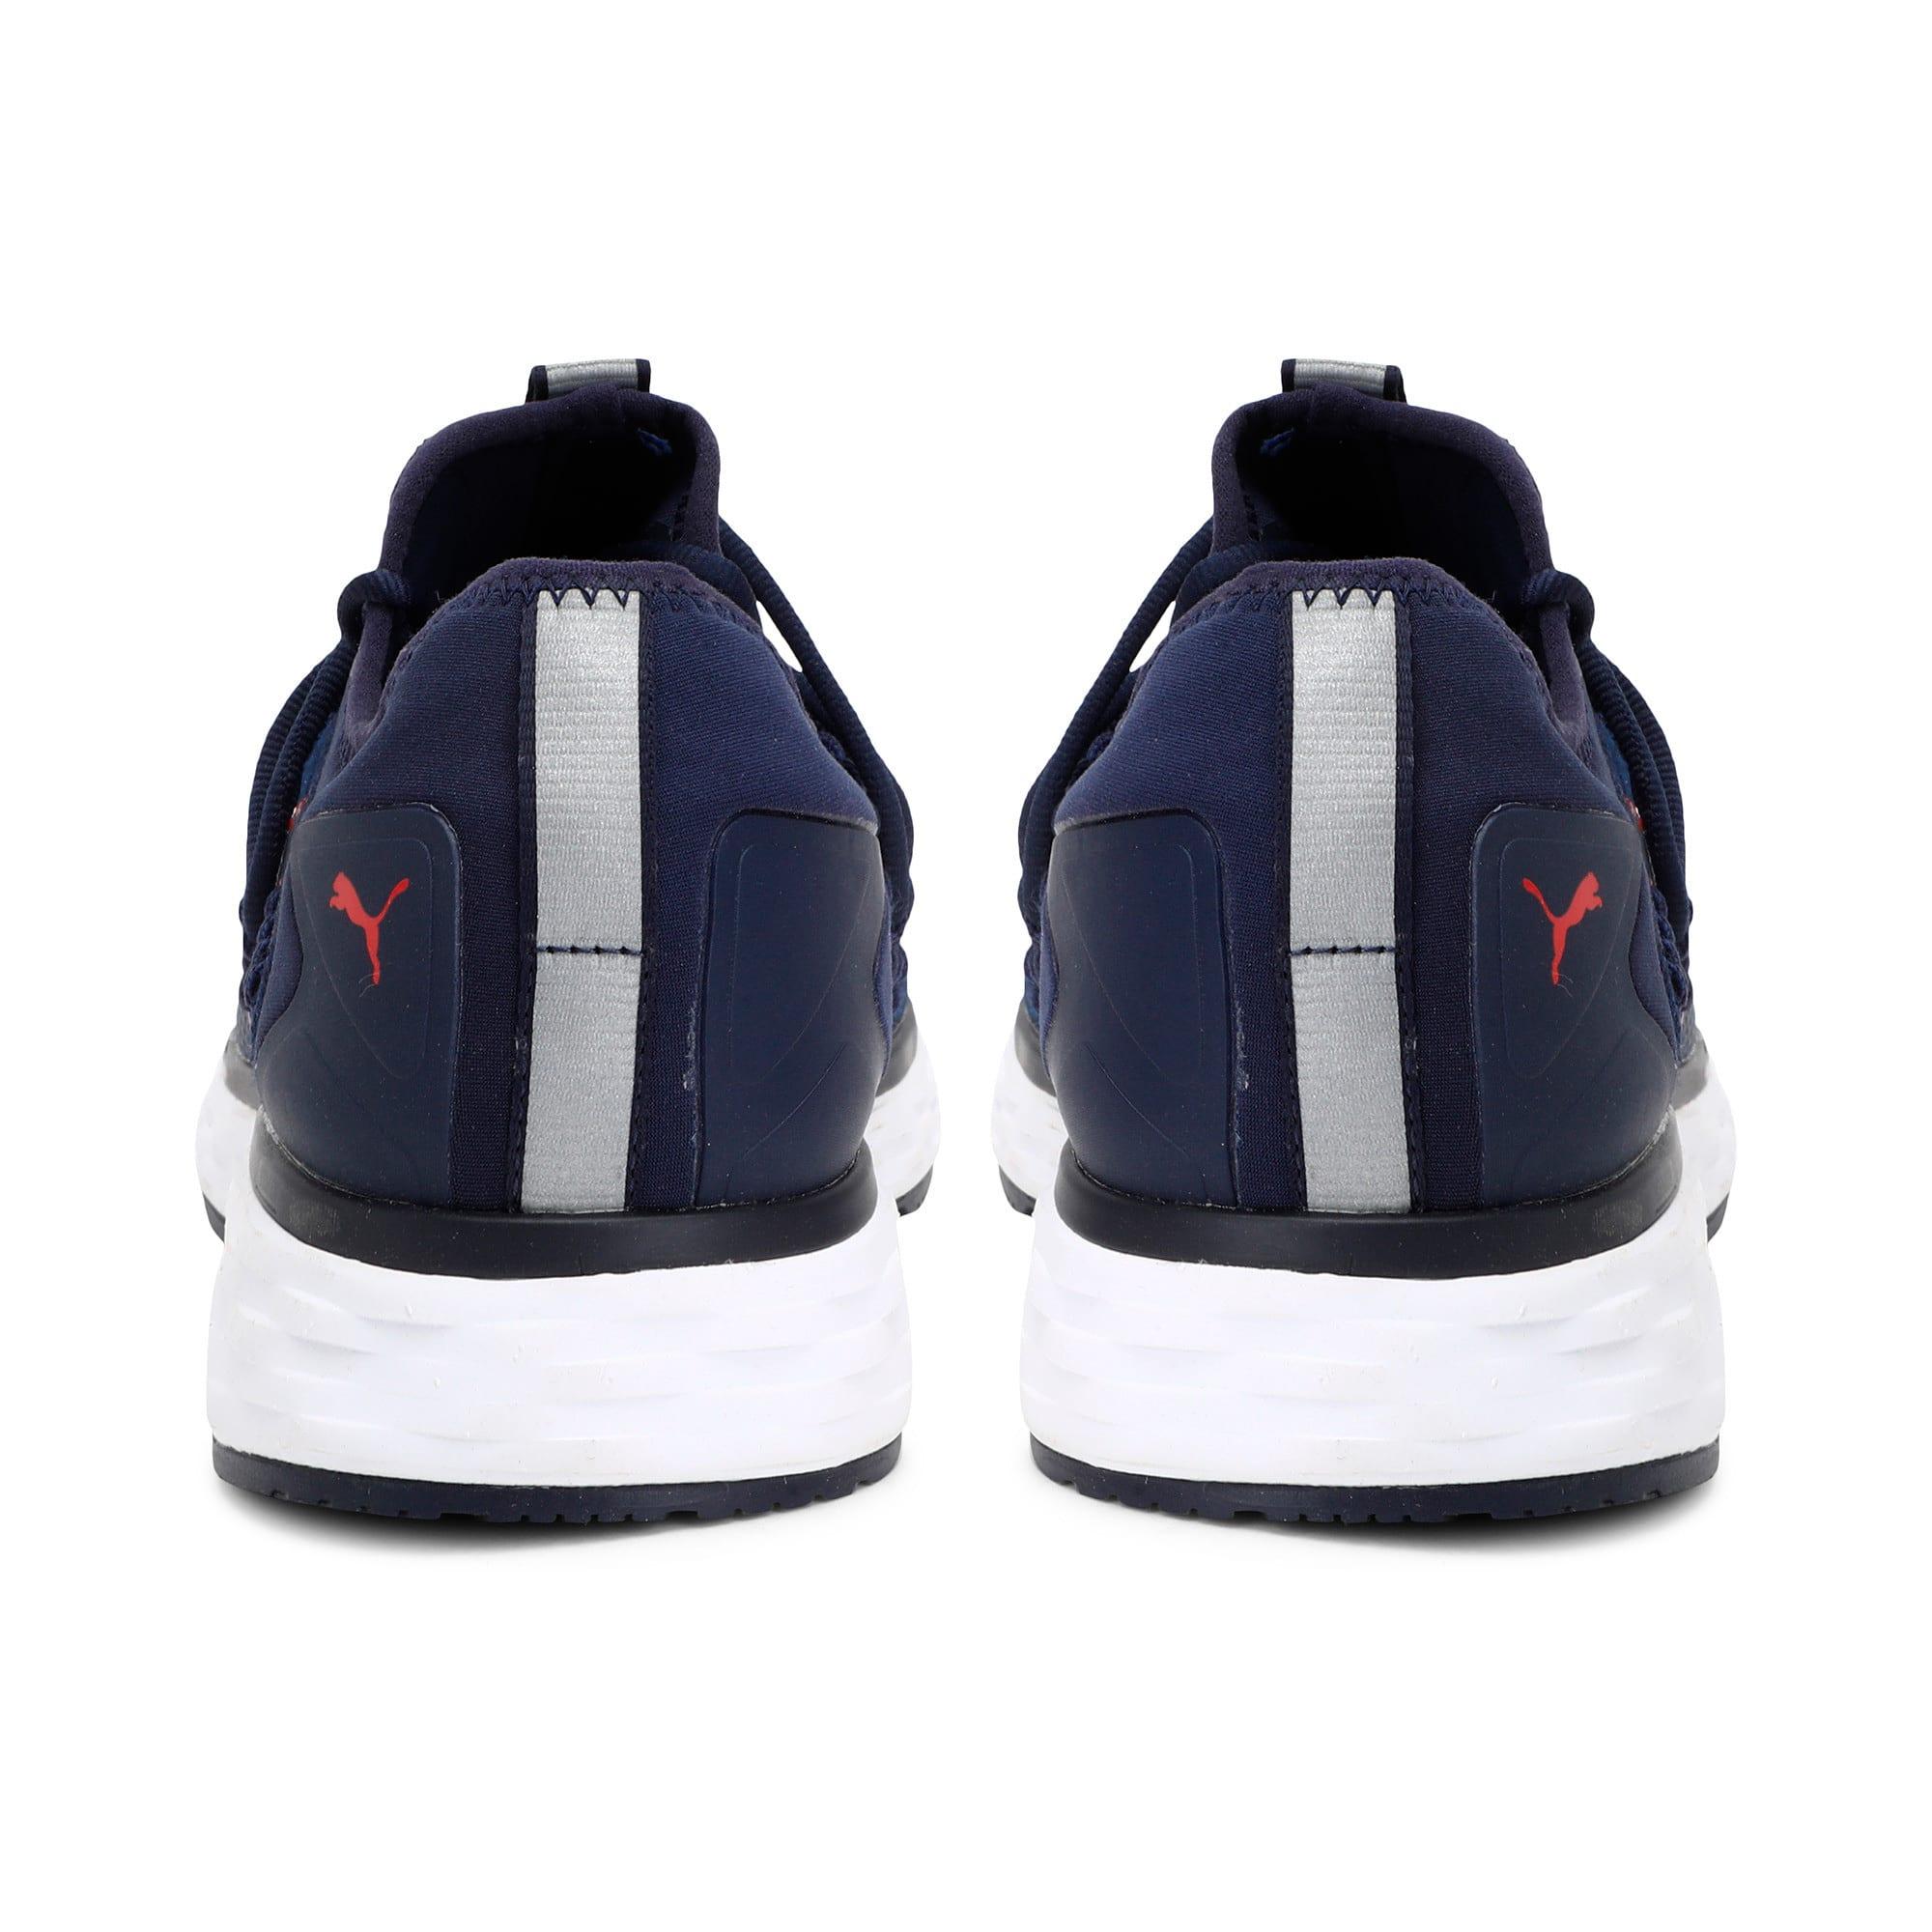 Thumbnail 4 of SPEED FUSEFIT Men's Running Shoes, Peacoat-Sodalite Blue, medium-IND